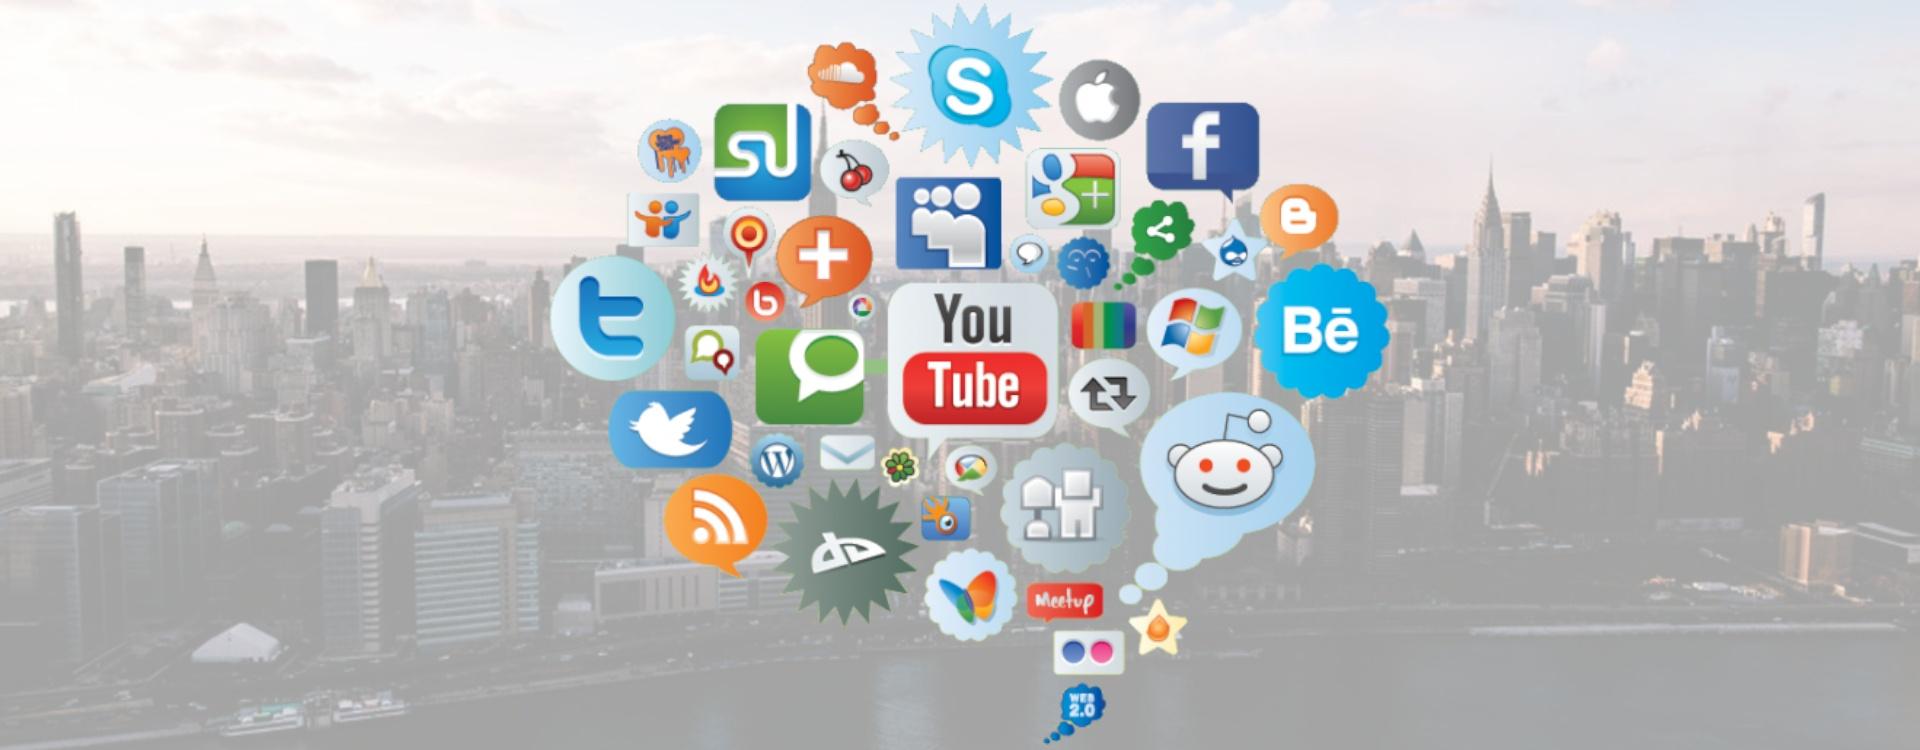 socialnet-image